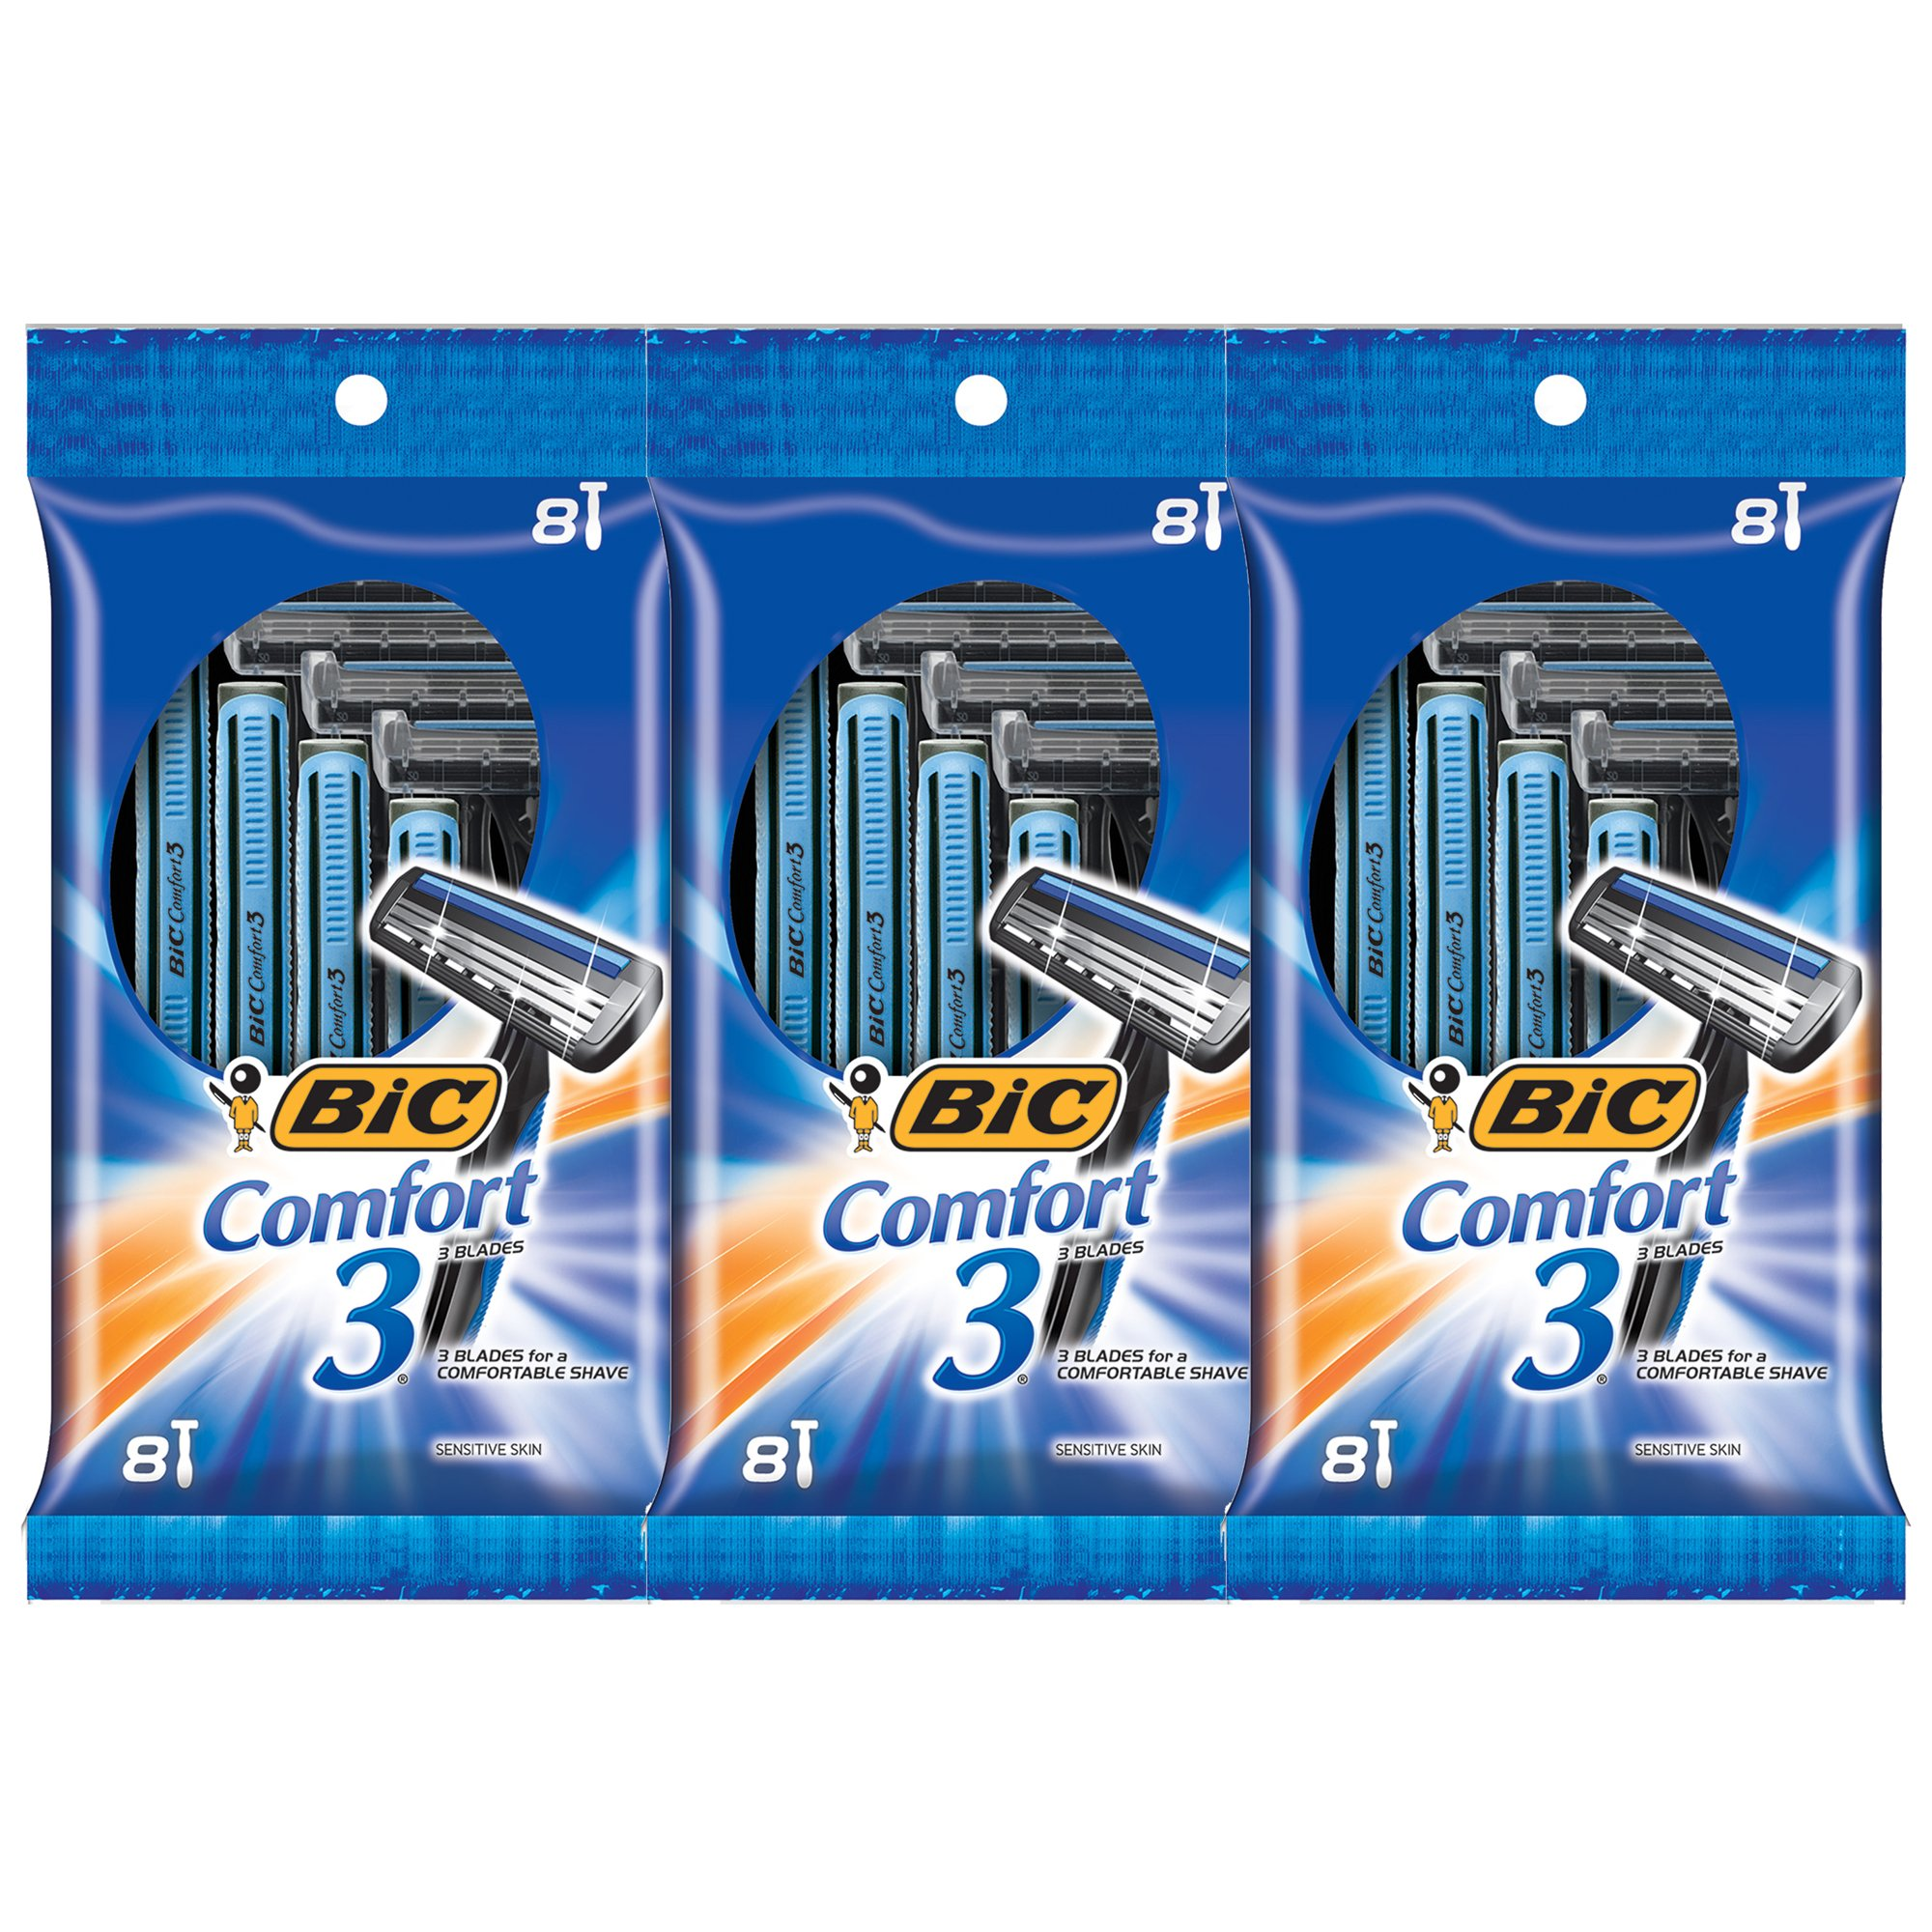 BIC Comfort Disposable Razor Count